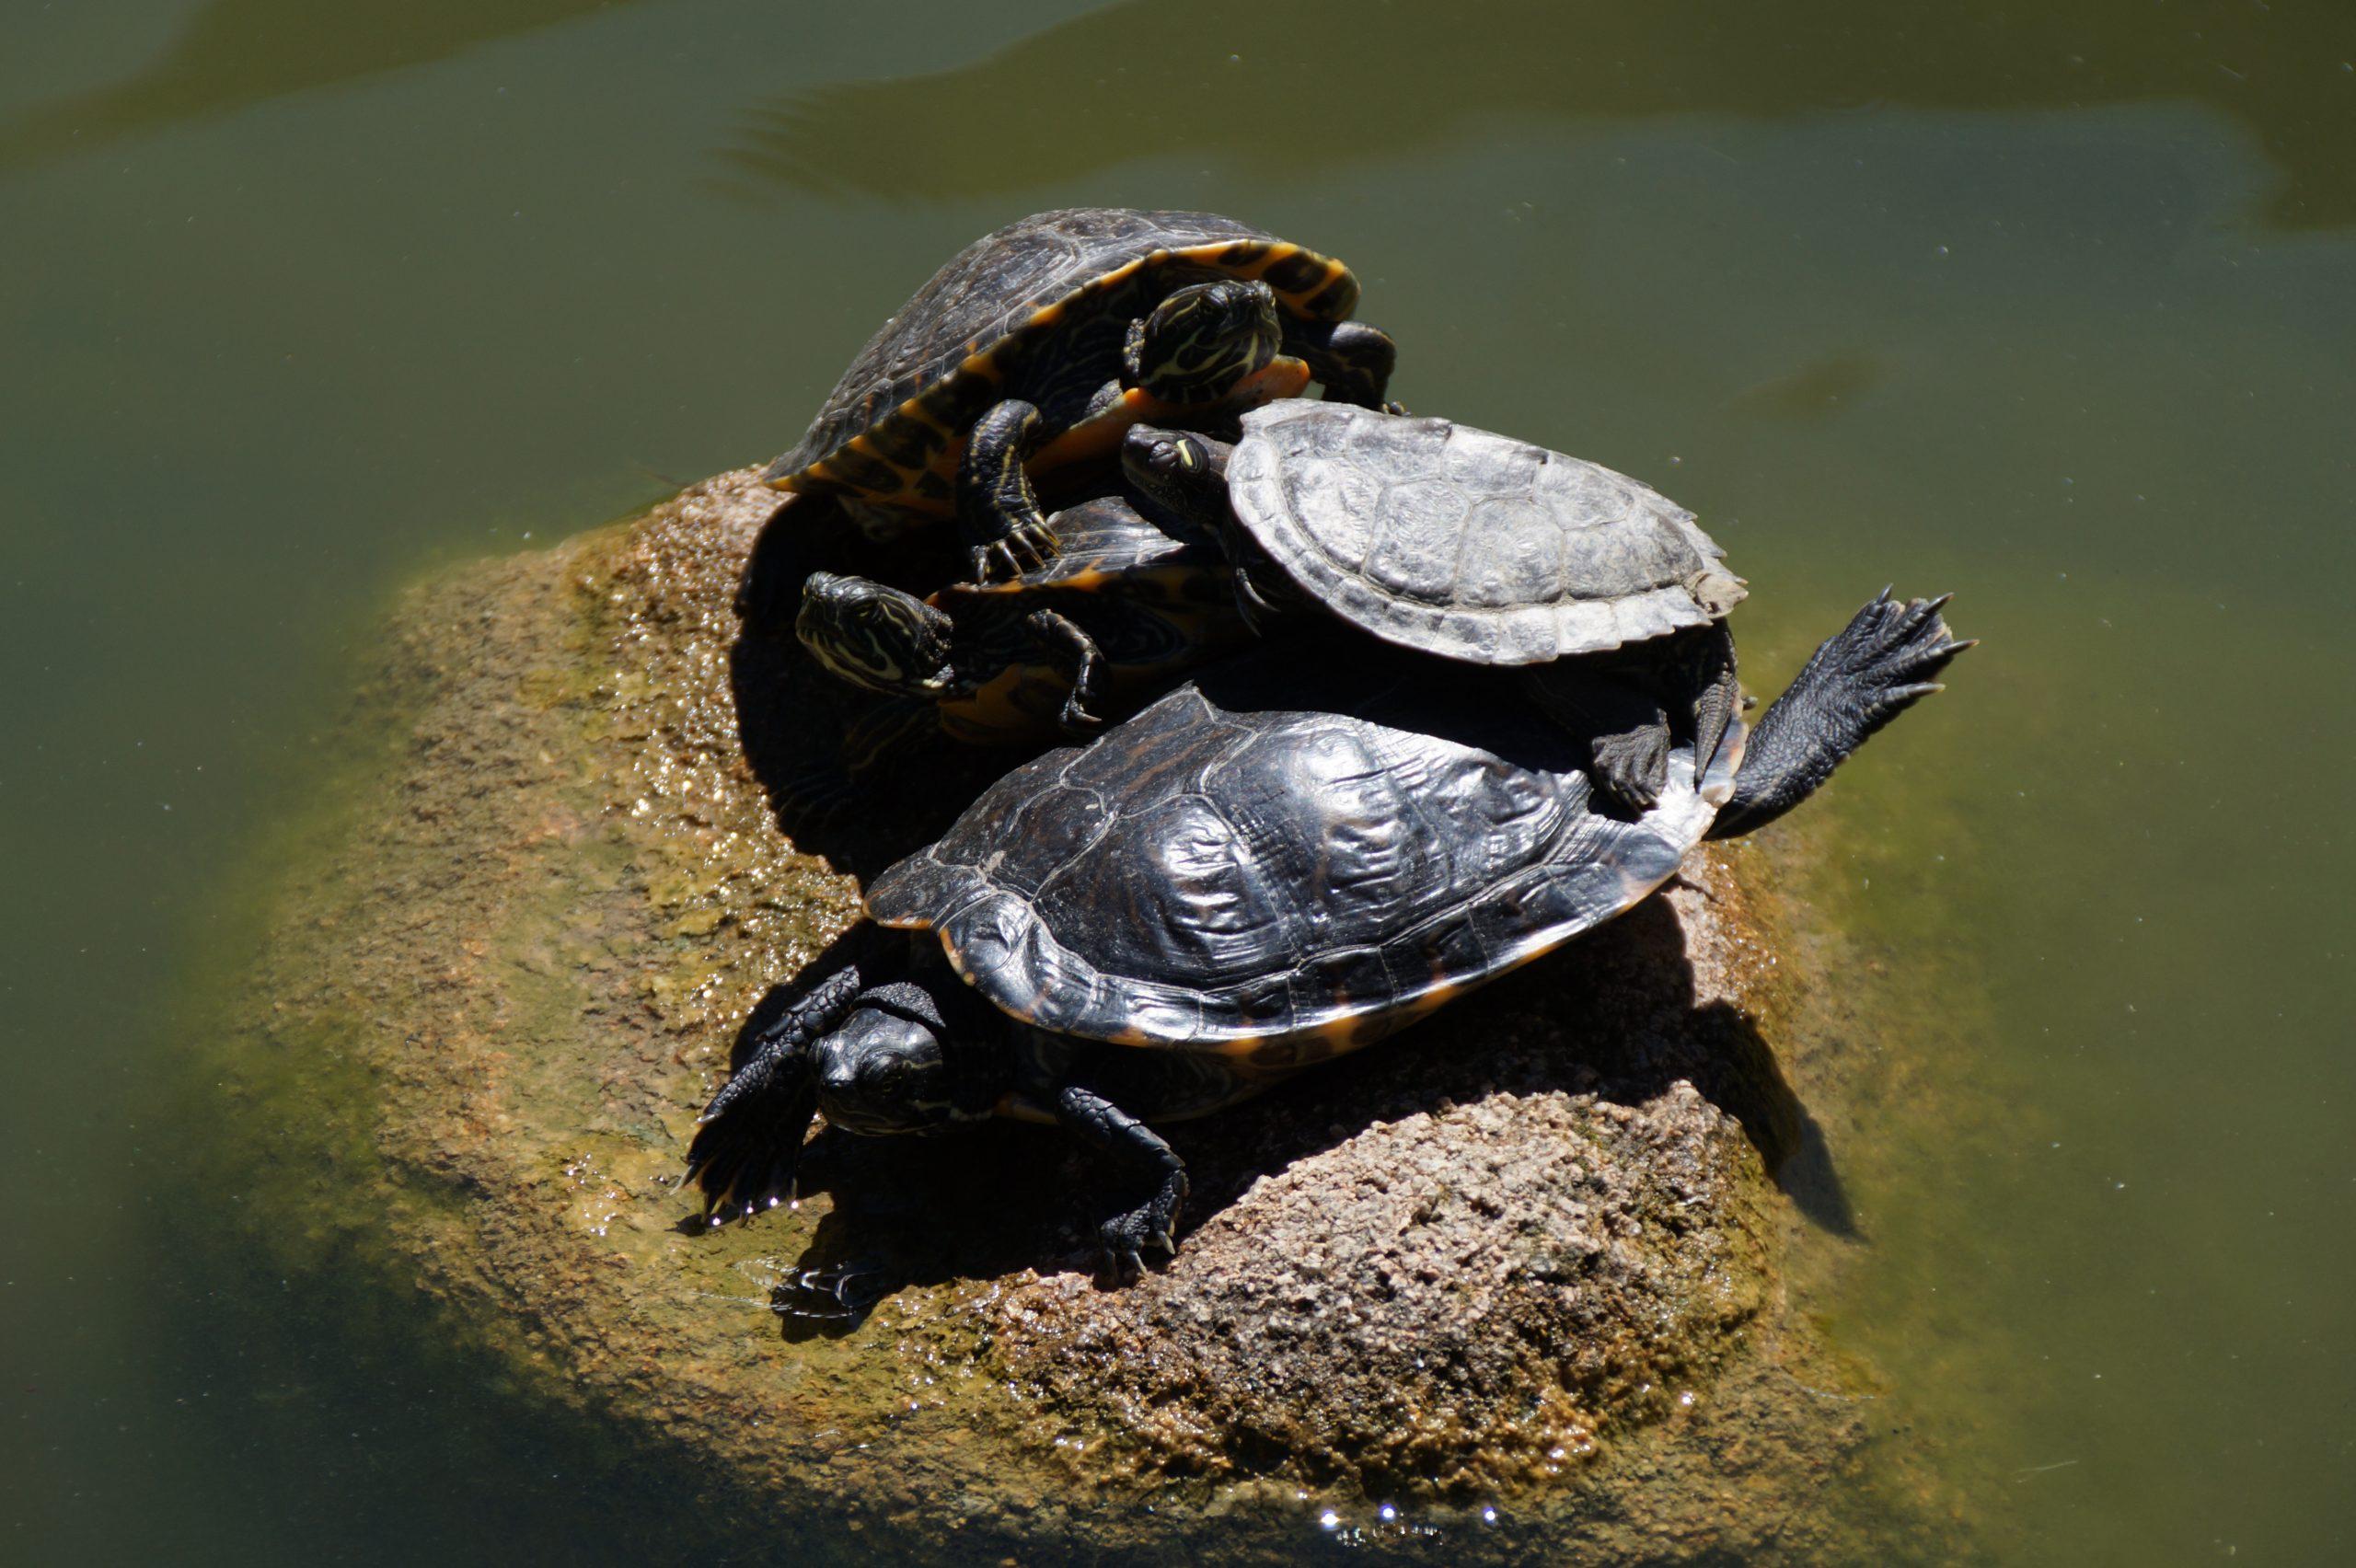 Tortoises, Gulbenkian Garden, Lisbon, Portugal